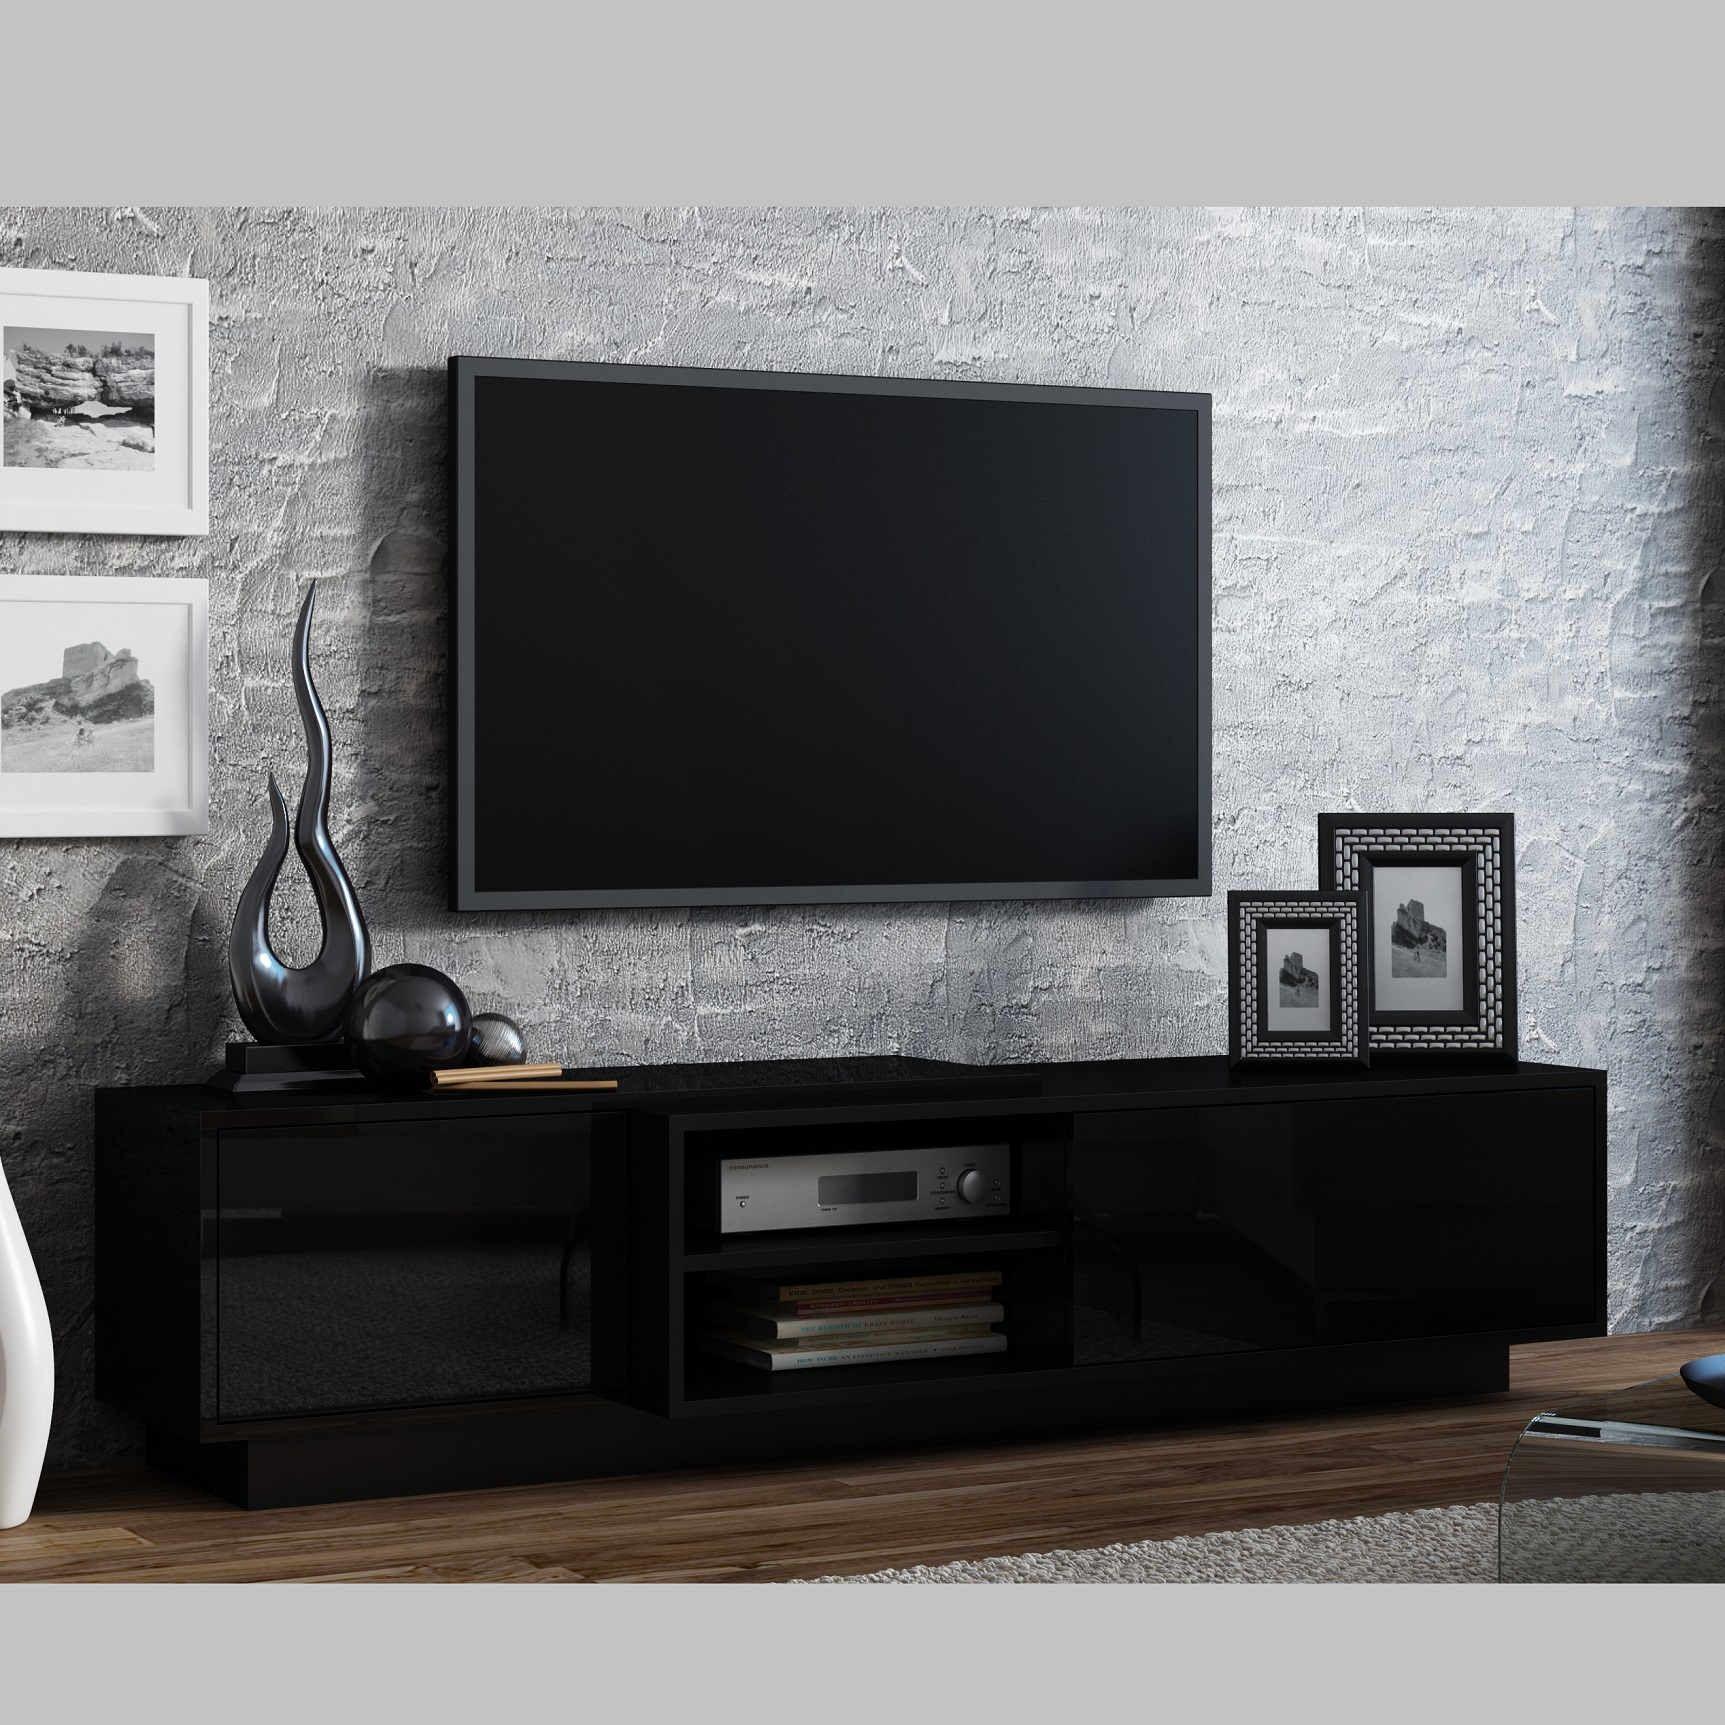 Redoutable Meuble Tv Noir Bois D Coration Fran Aise Pinterest  # Meuble Tv Noir Bois